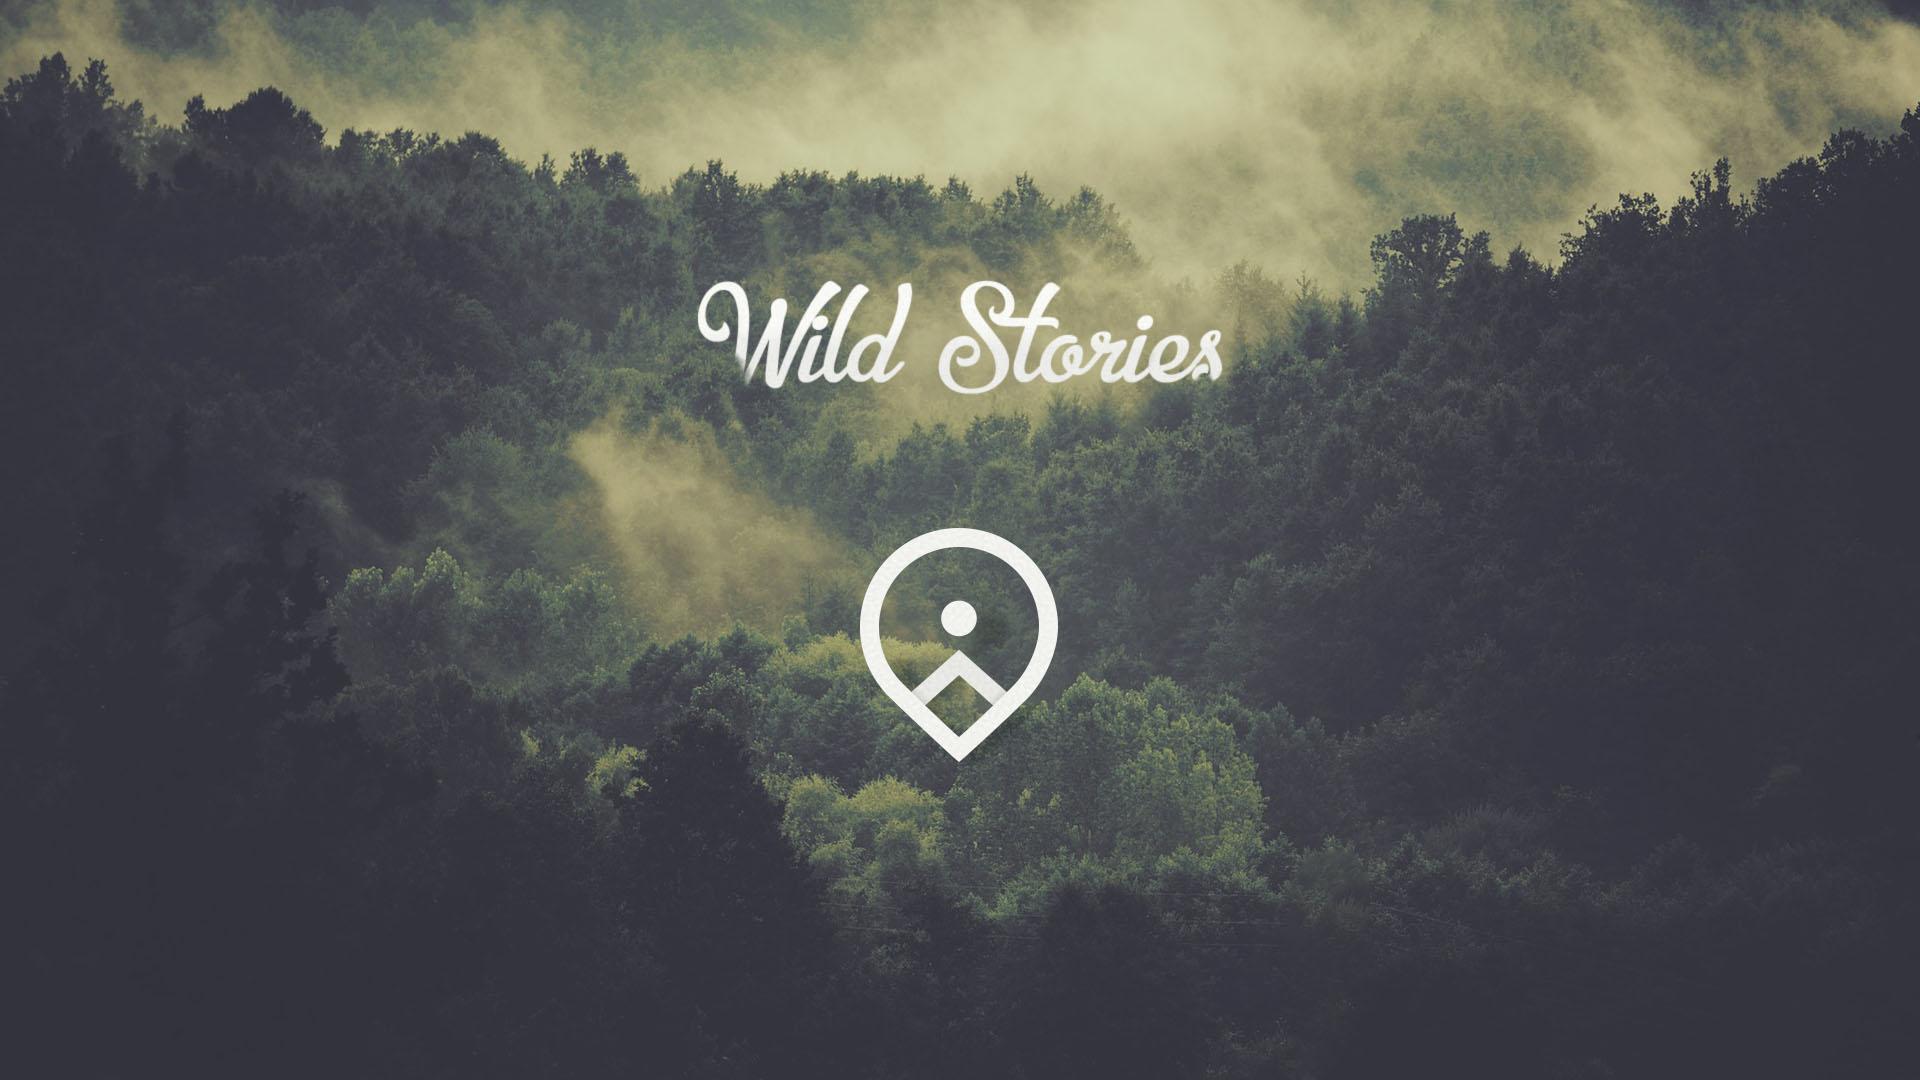 Wild Stories Screen